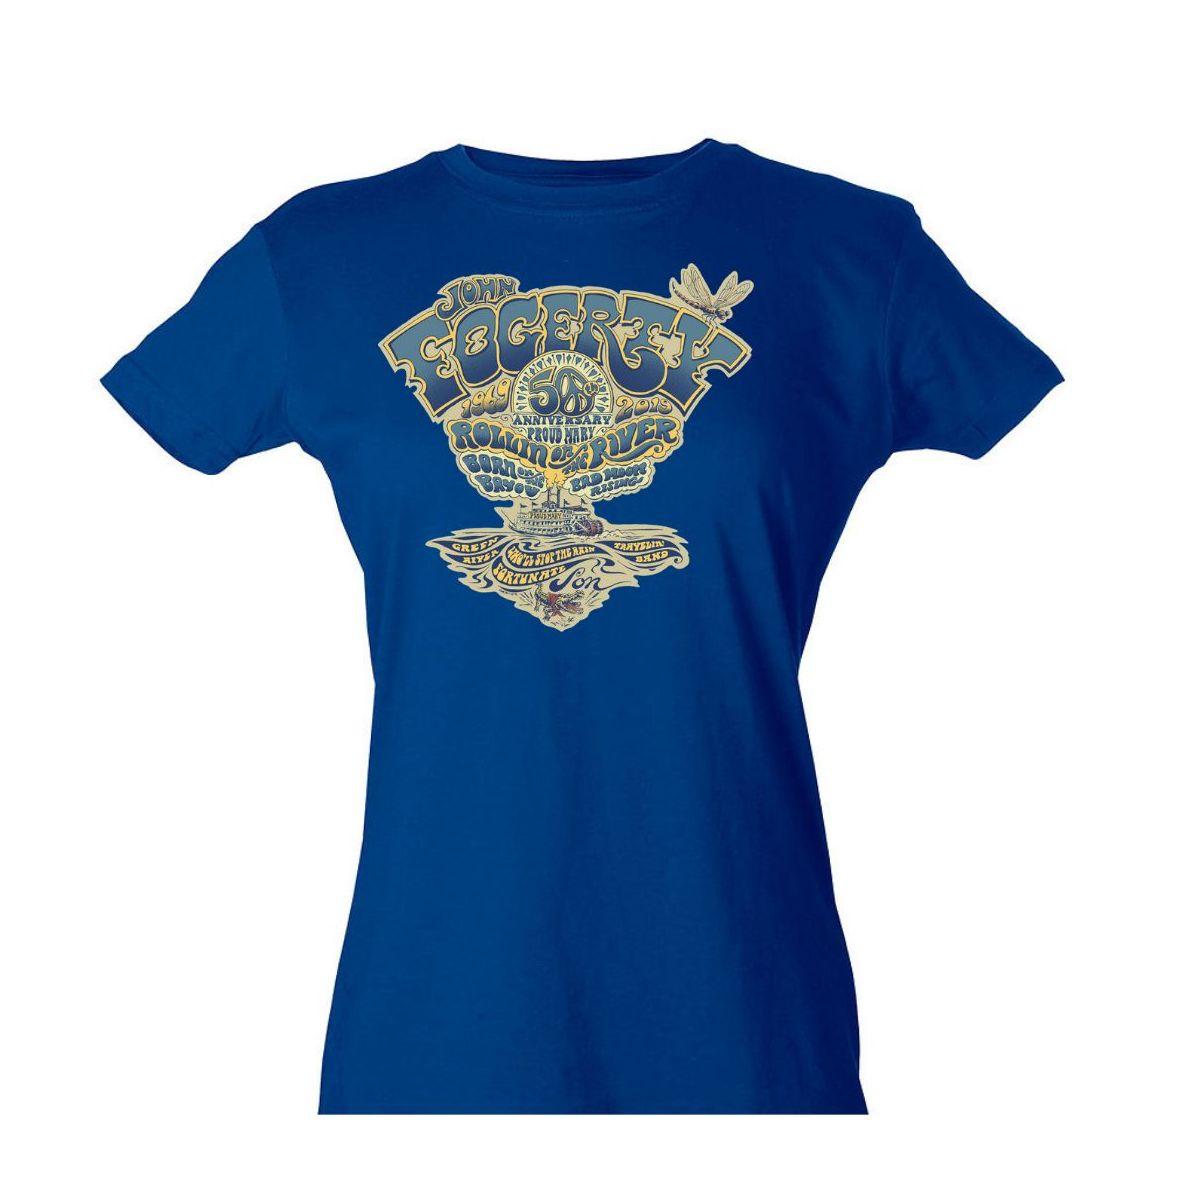 Women's John Fogerty 50th Anniversary Crest T-Shirt